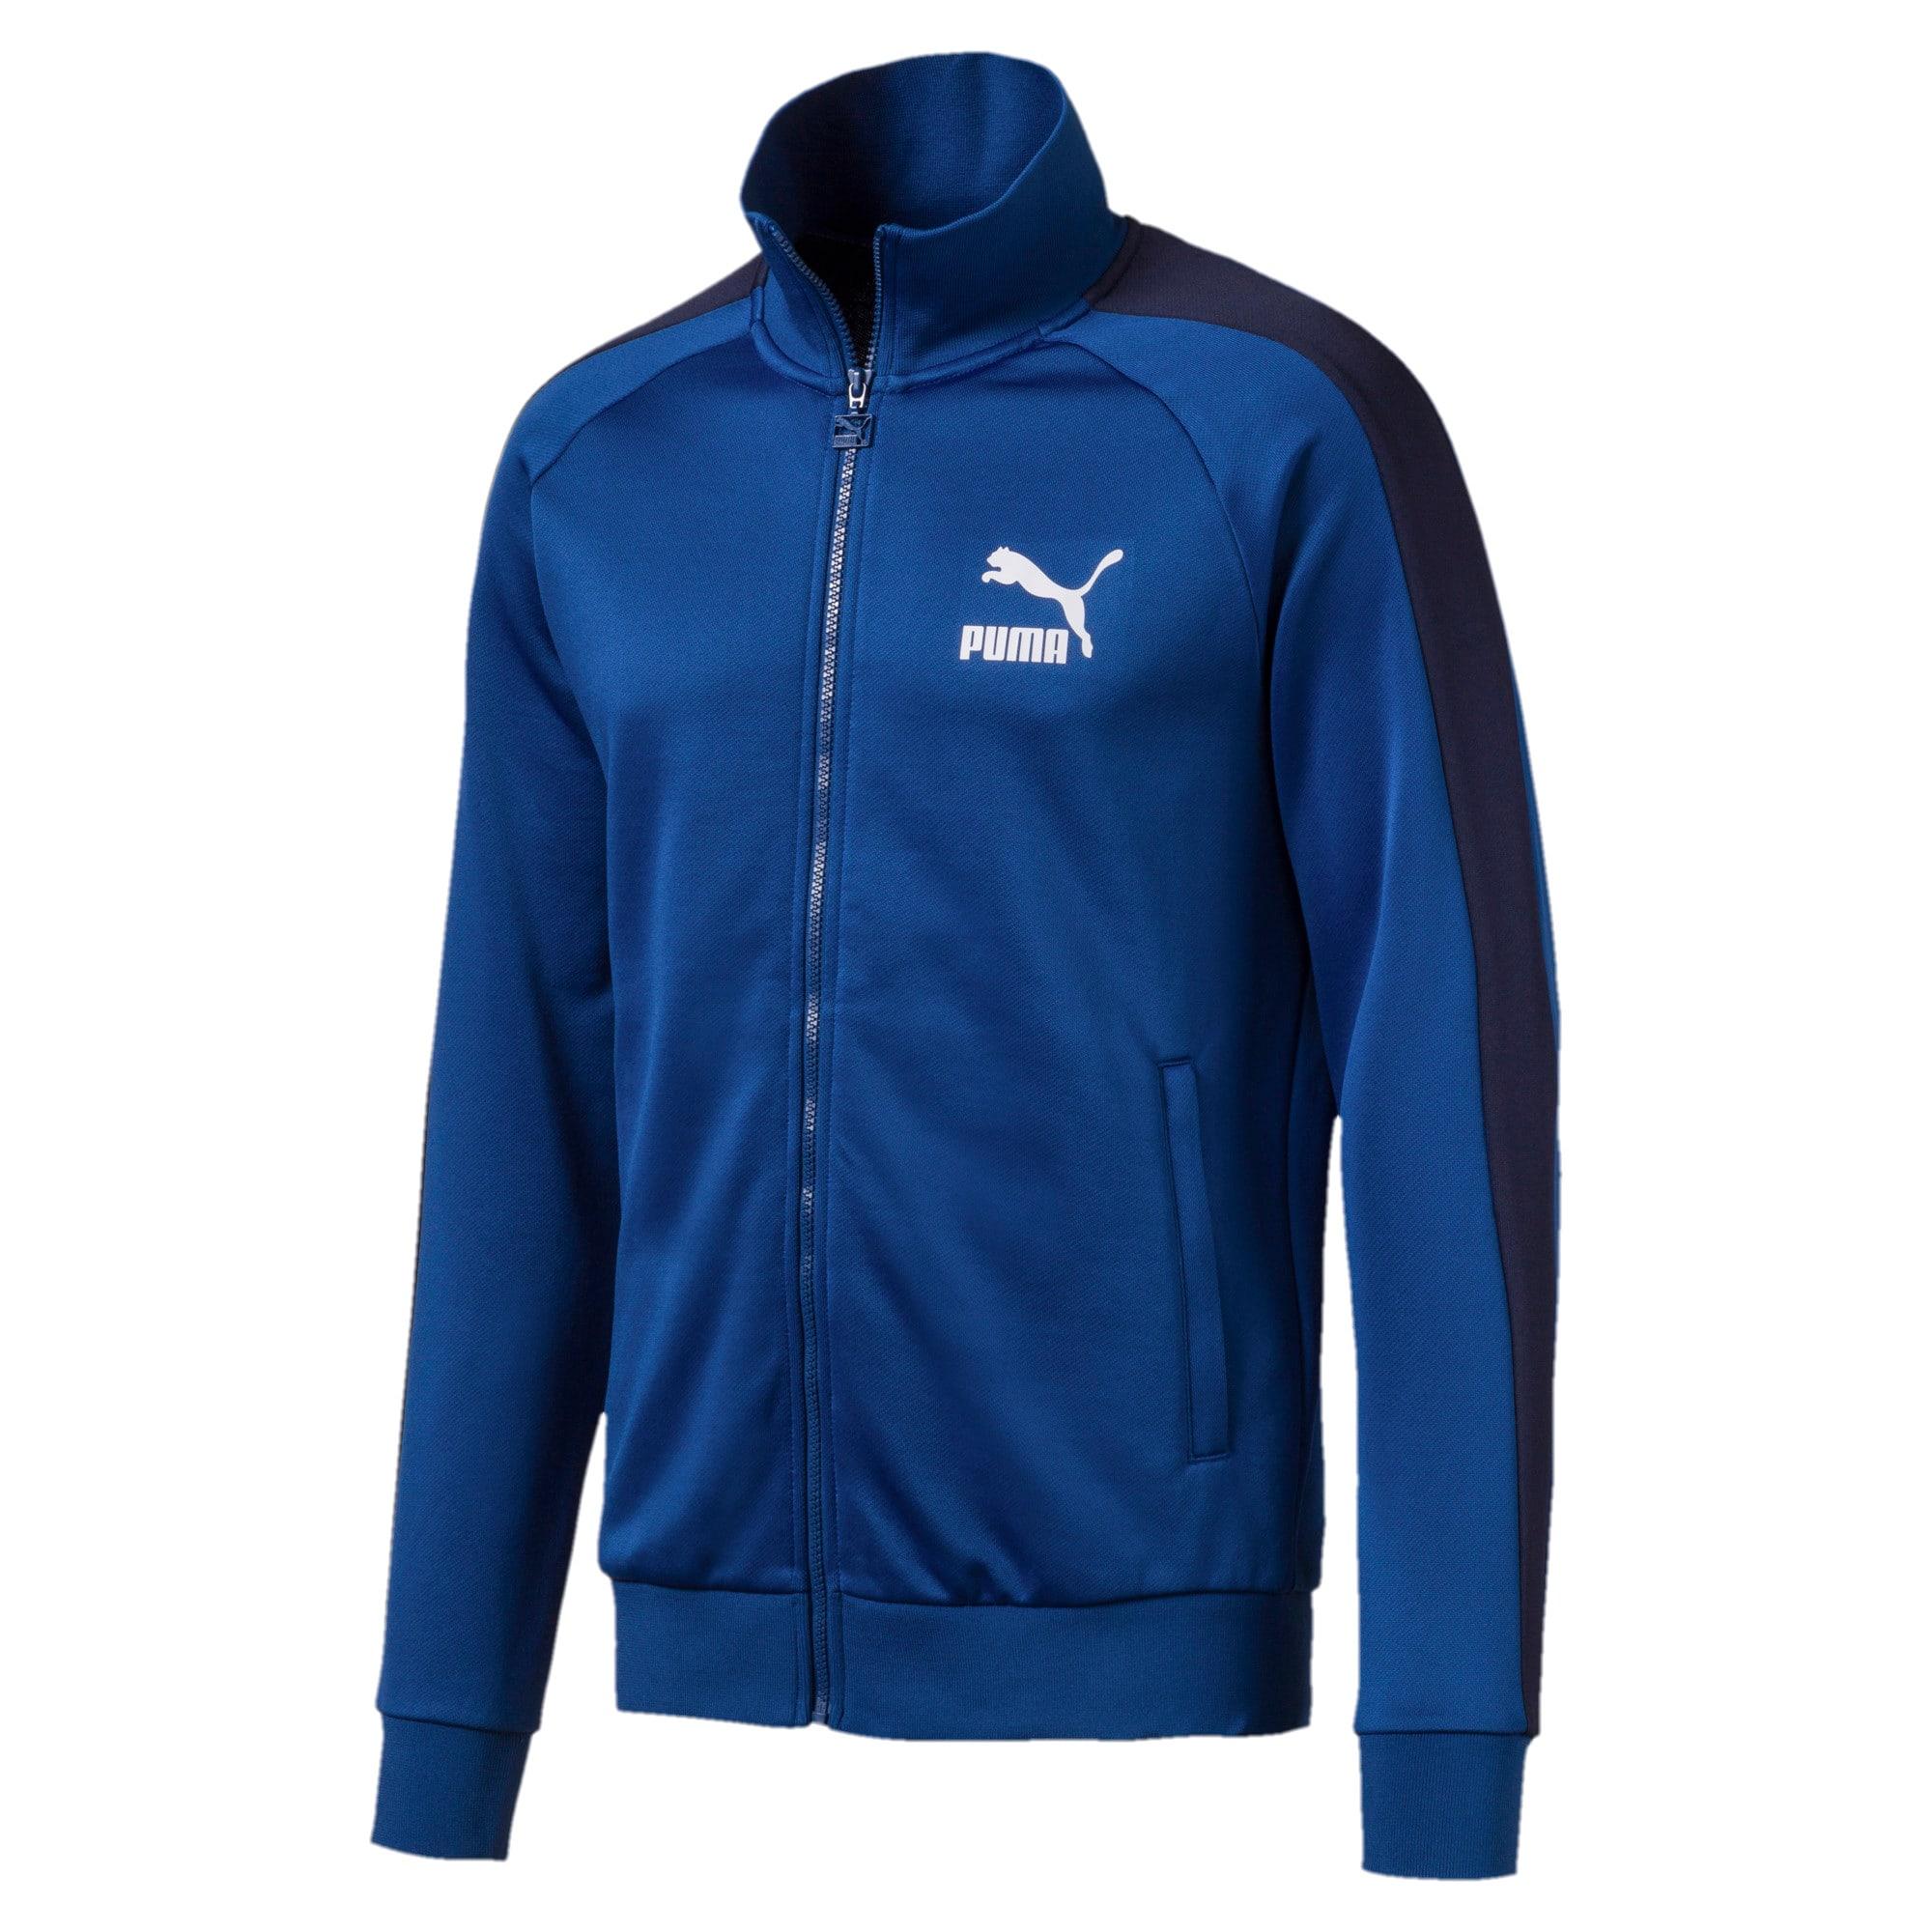 Thumbnail 1 of Iconic T7 Men's Track Jacket, Galaxy Blue, medium